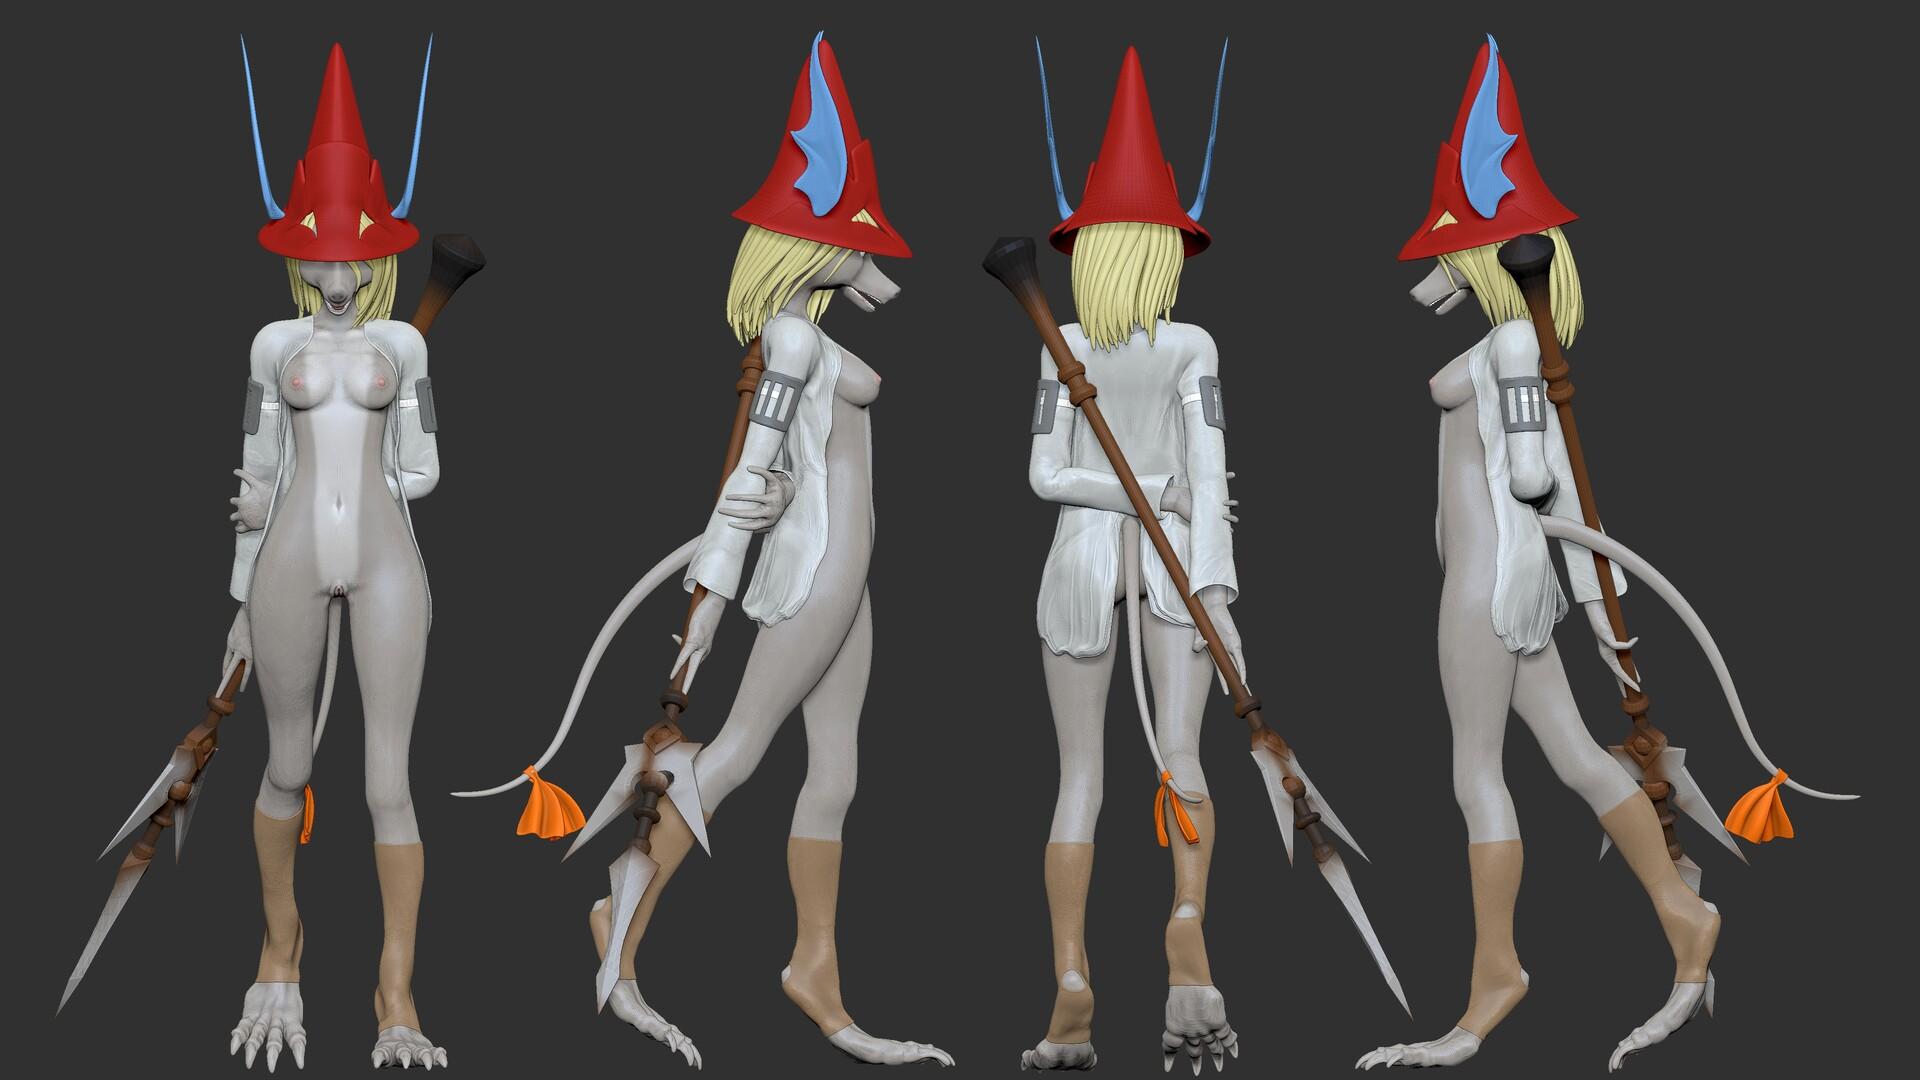 Andrey Bykov Freya Crescent From Final Fantasy Ix See more of freya crescent on facebook. freya crescent from final fantasy ix